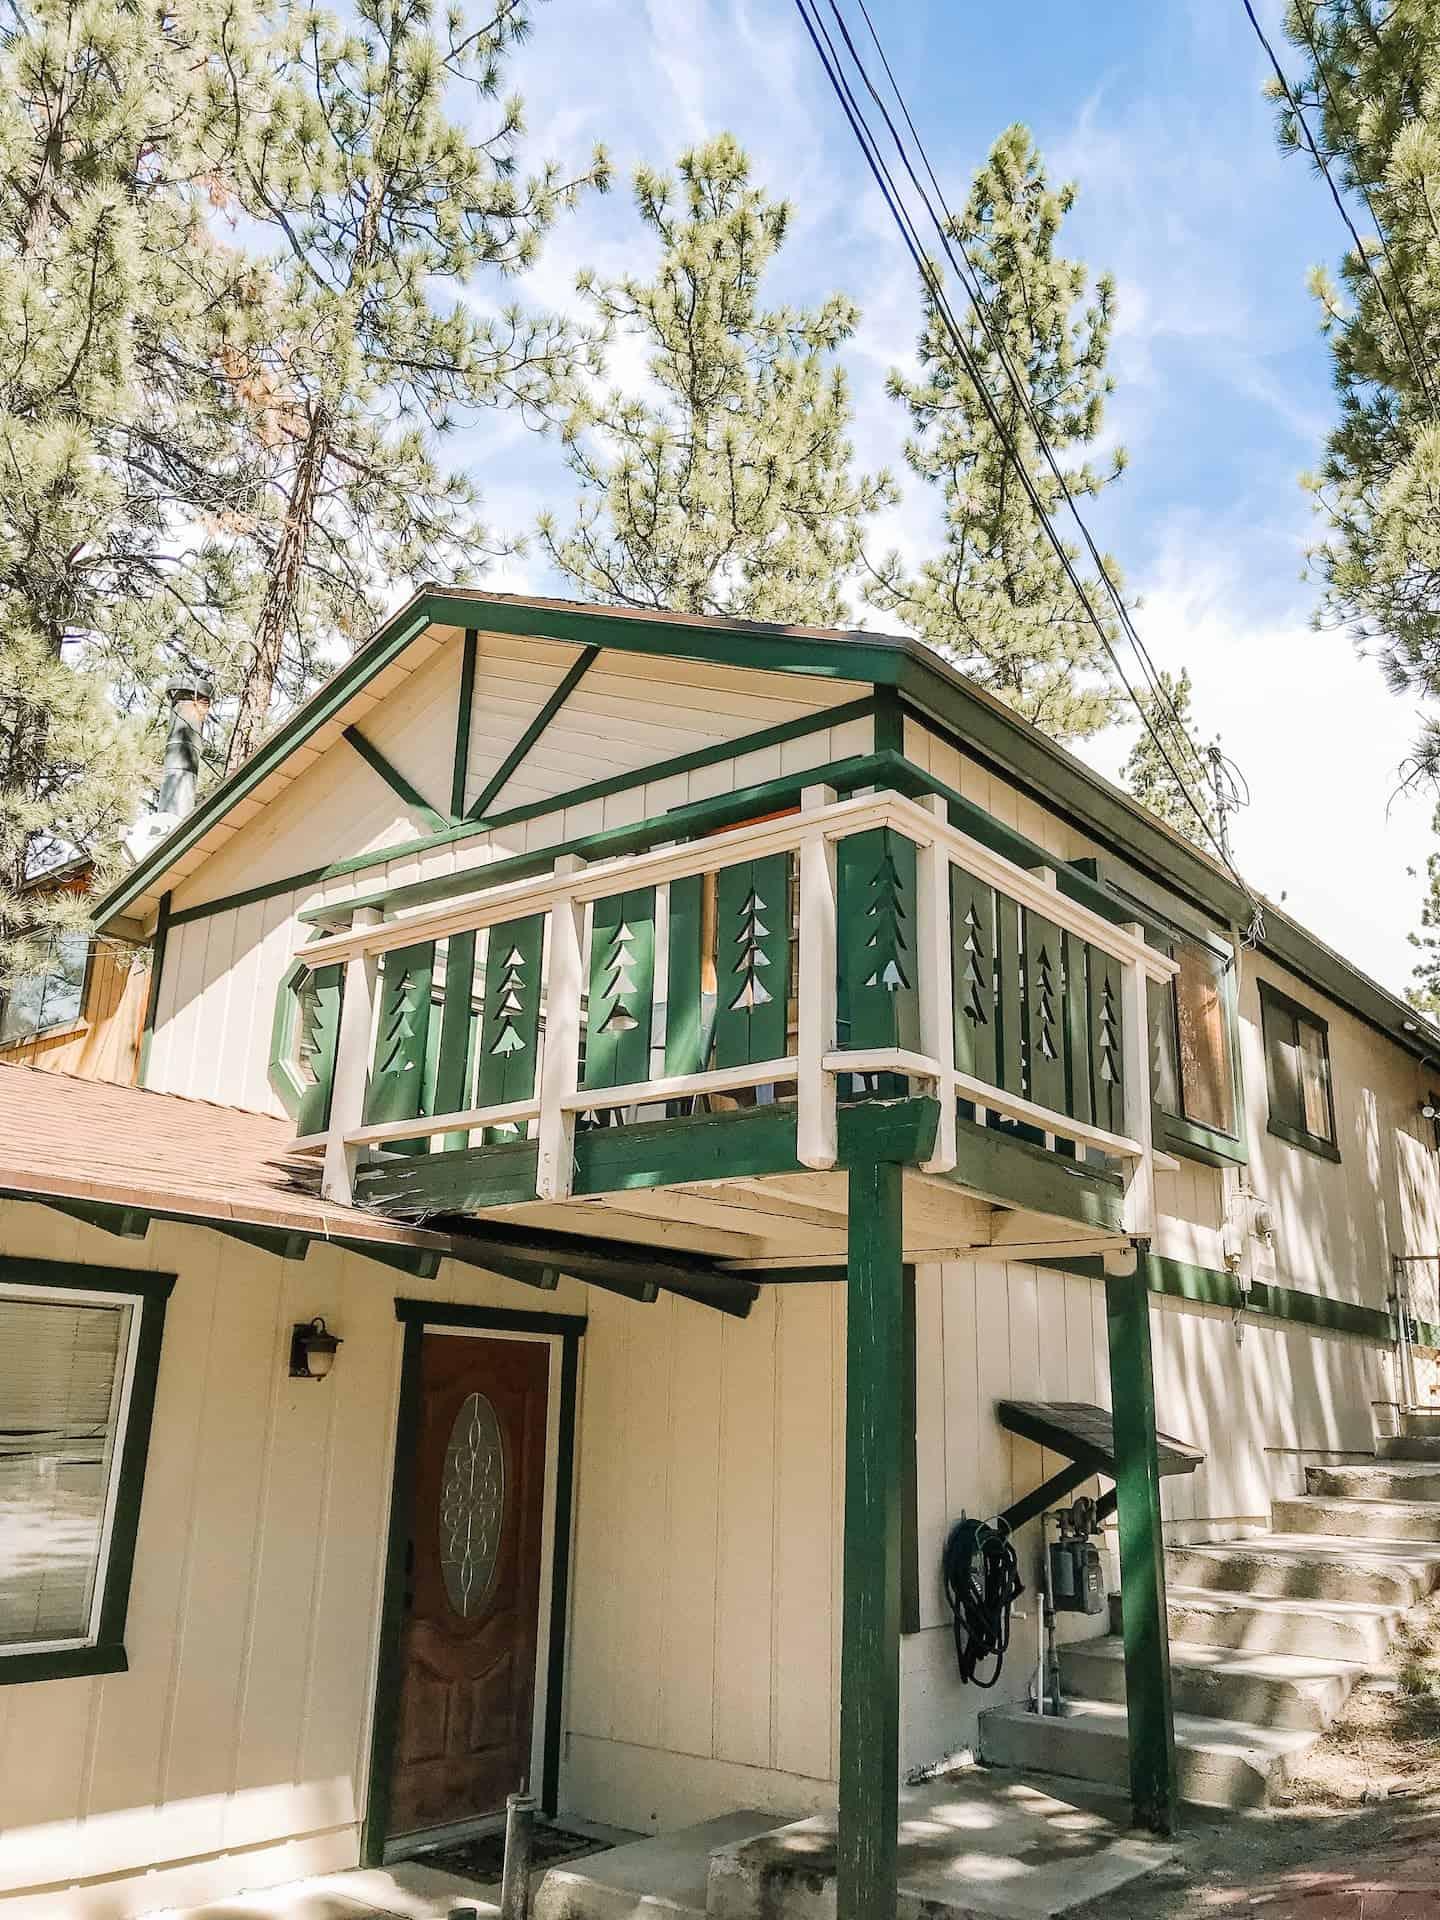 Image of cabin rental in Big Bear